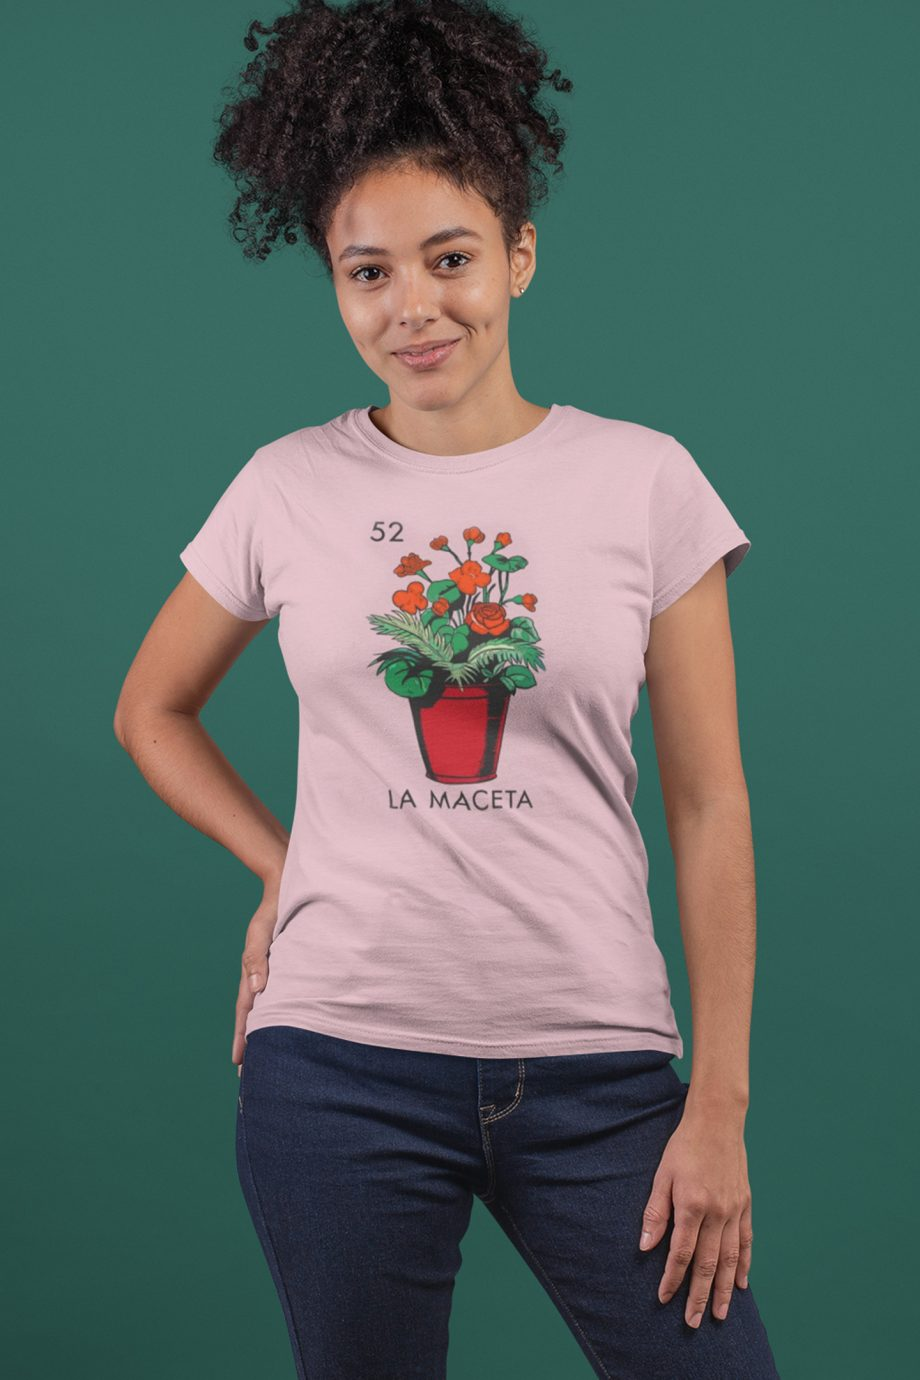 La Maceta Loteria Potted Plant Women's T-Shirt